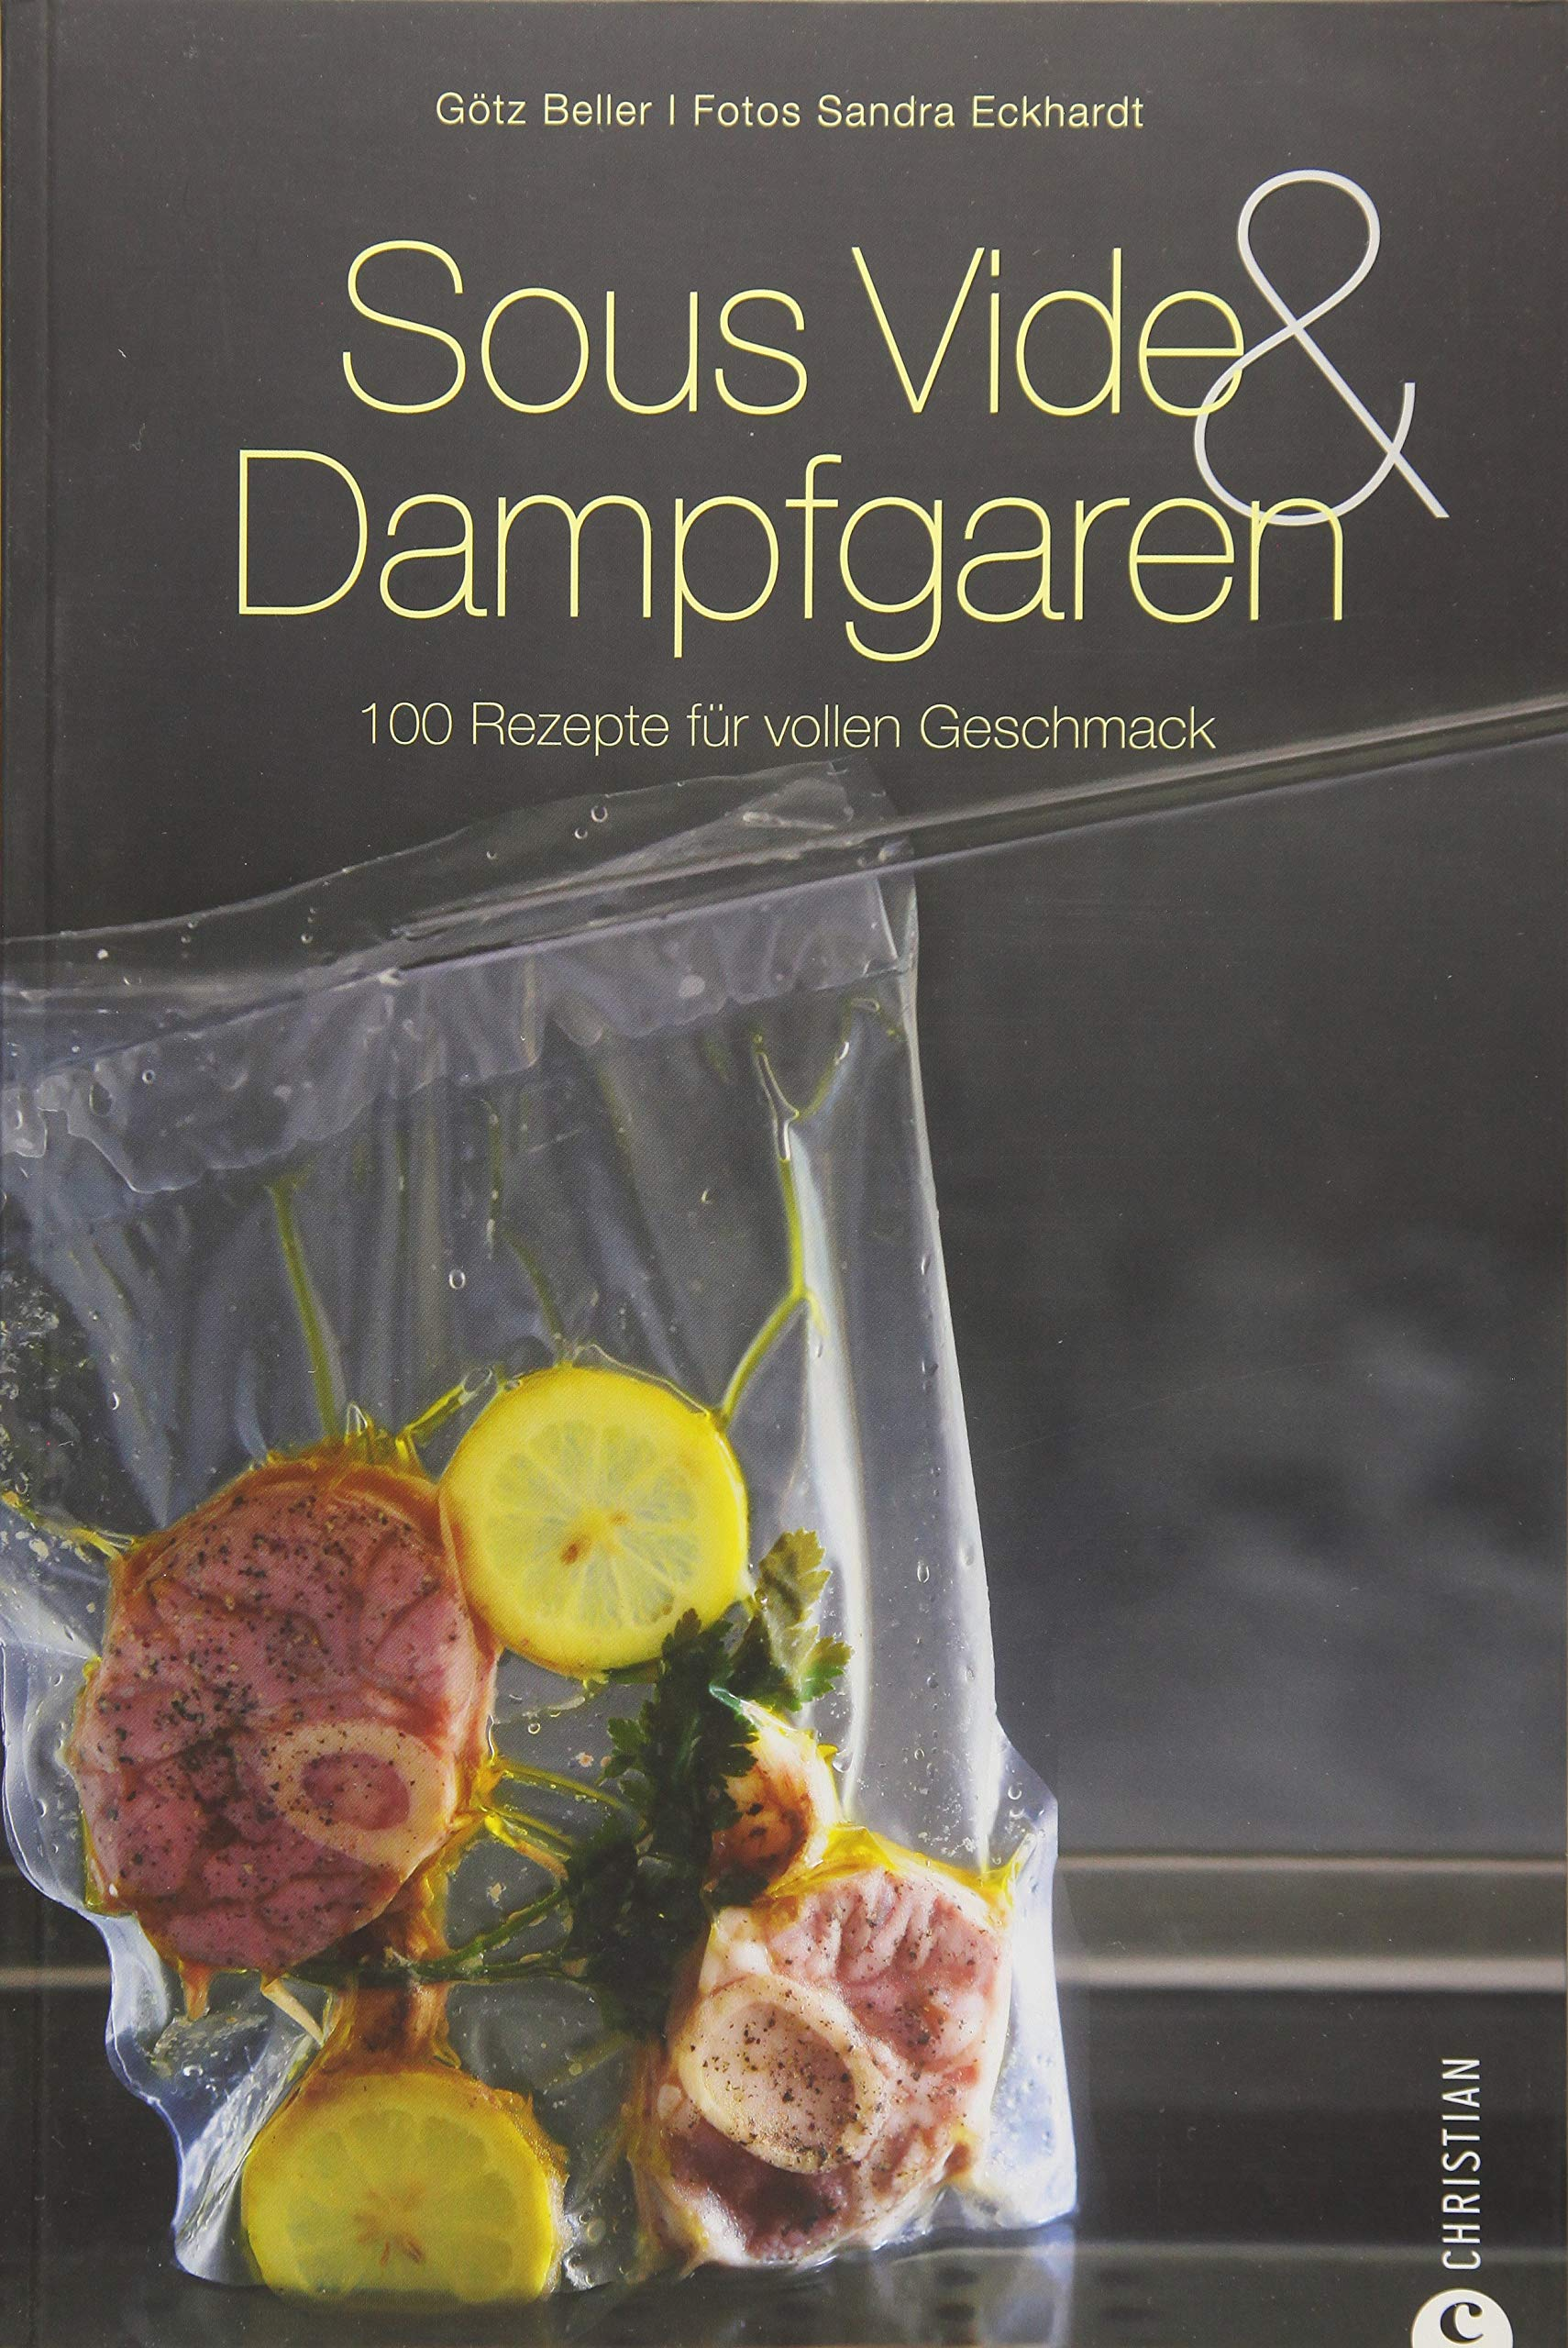 Sous-Vide & Dampfgaren: 100 Rezepte fr vollen Geschmack: Amazon.es: Beller, Gtz, Eckhardt, Sandra: Libros en idiomas extranjeros